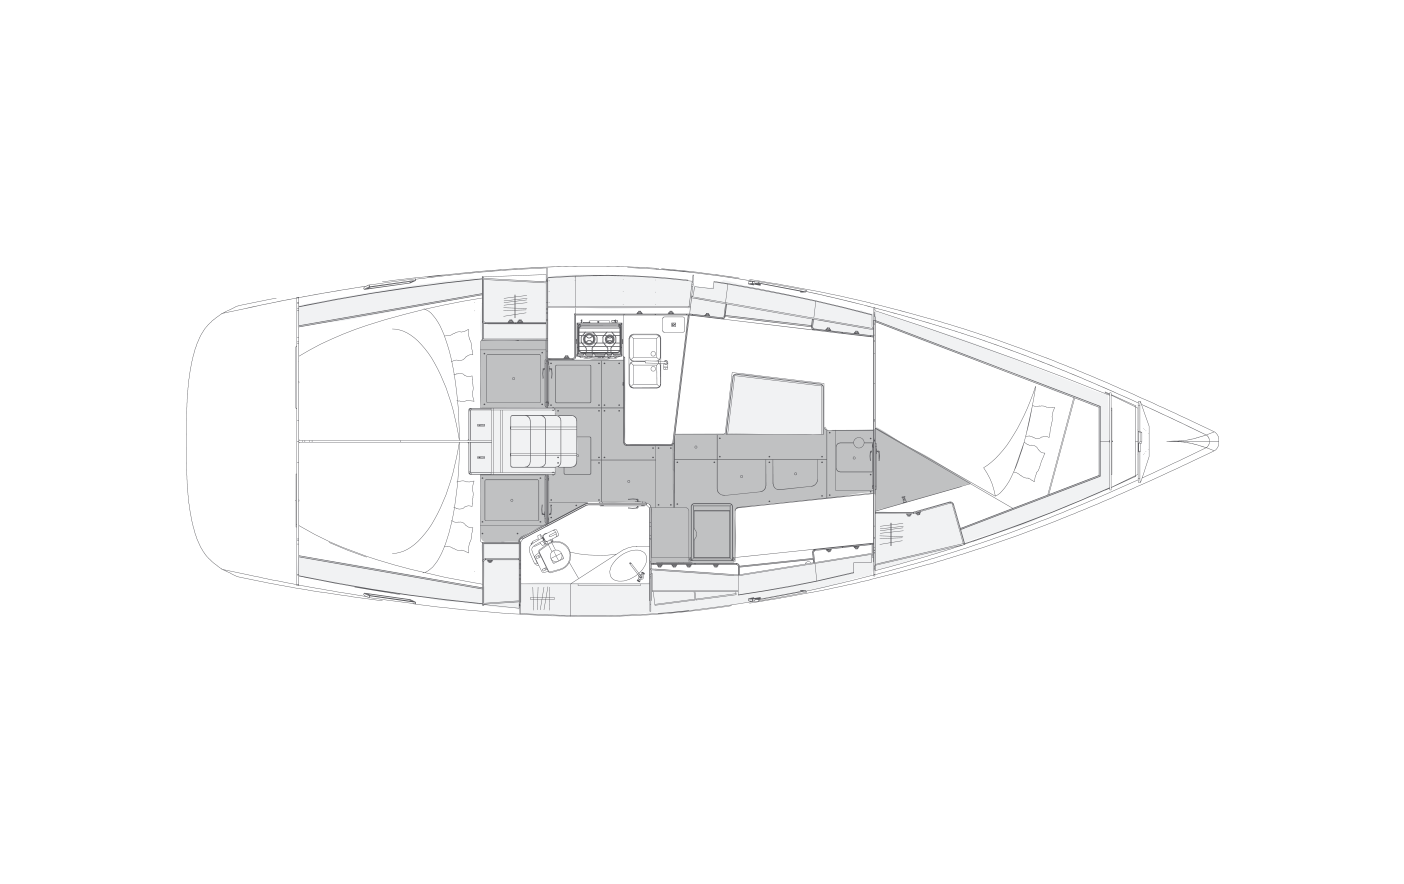 i40.1 - 3 cabins & 1 head